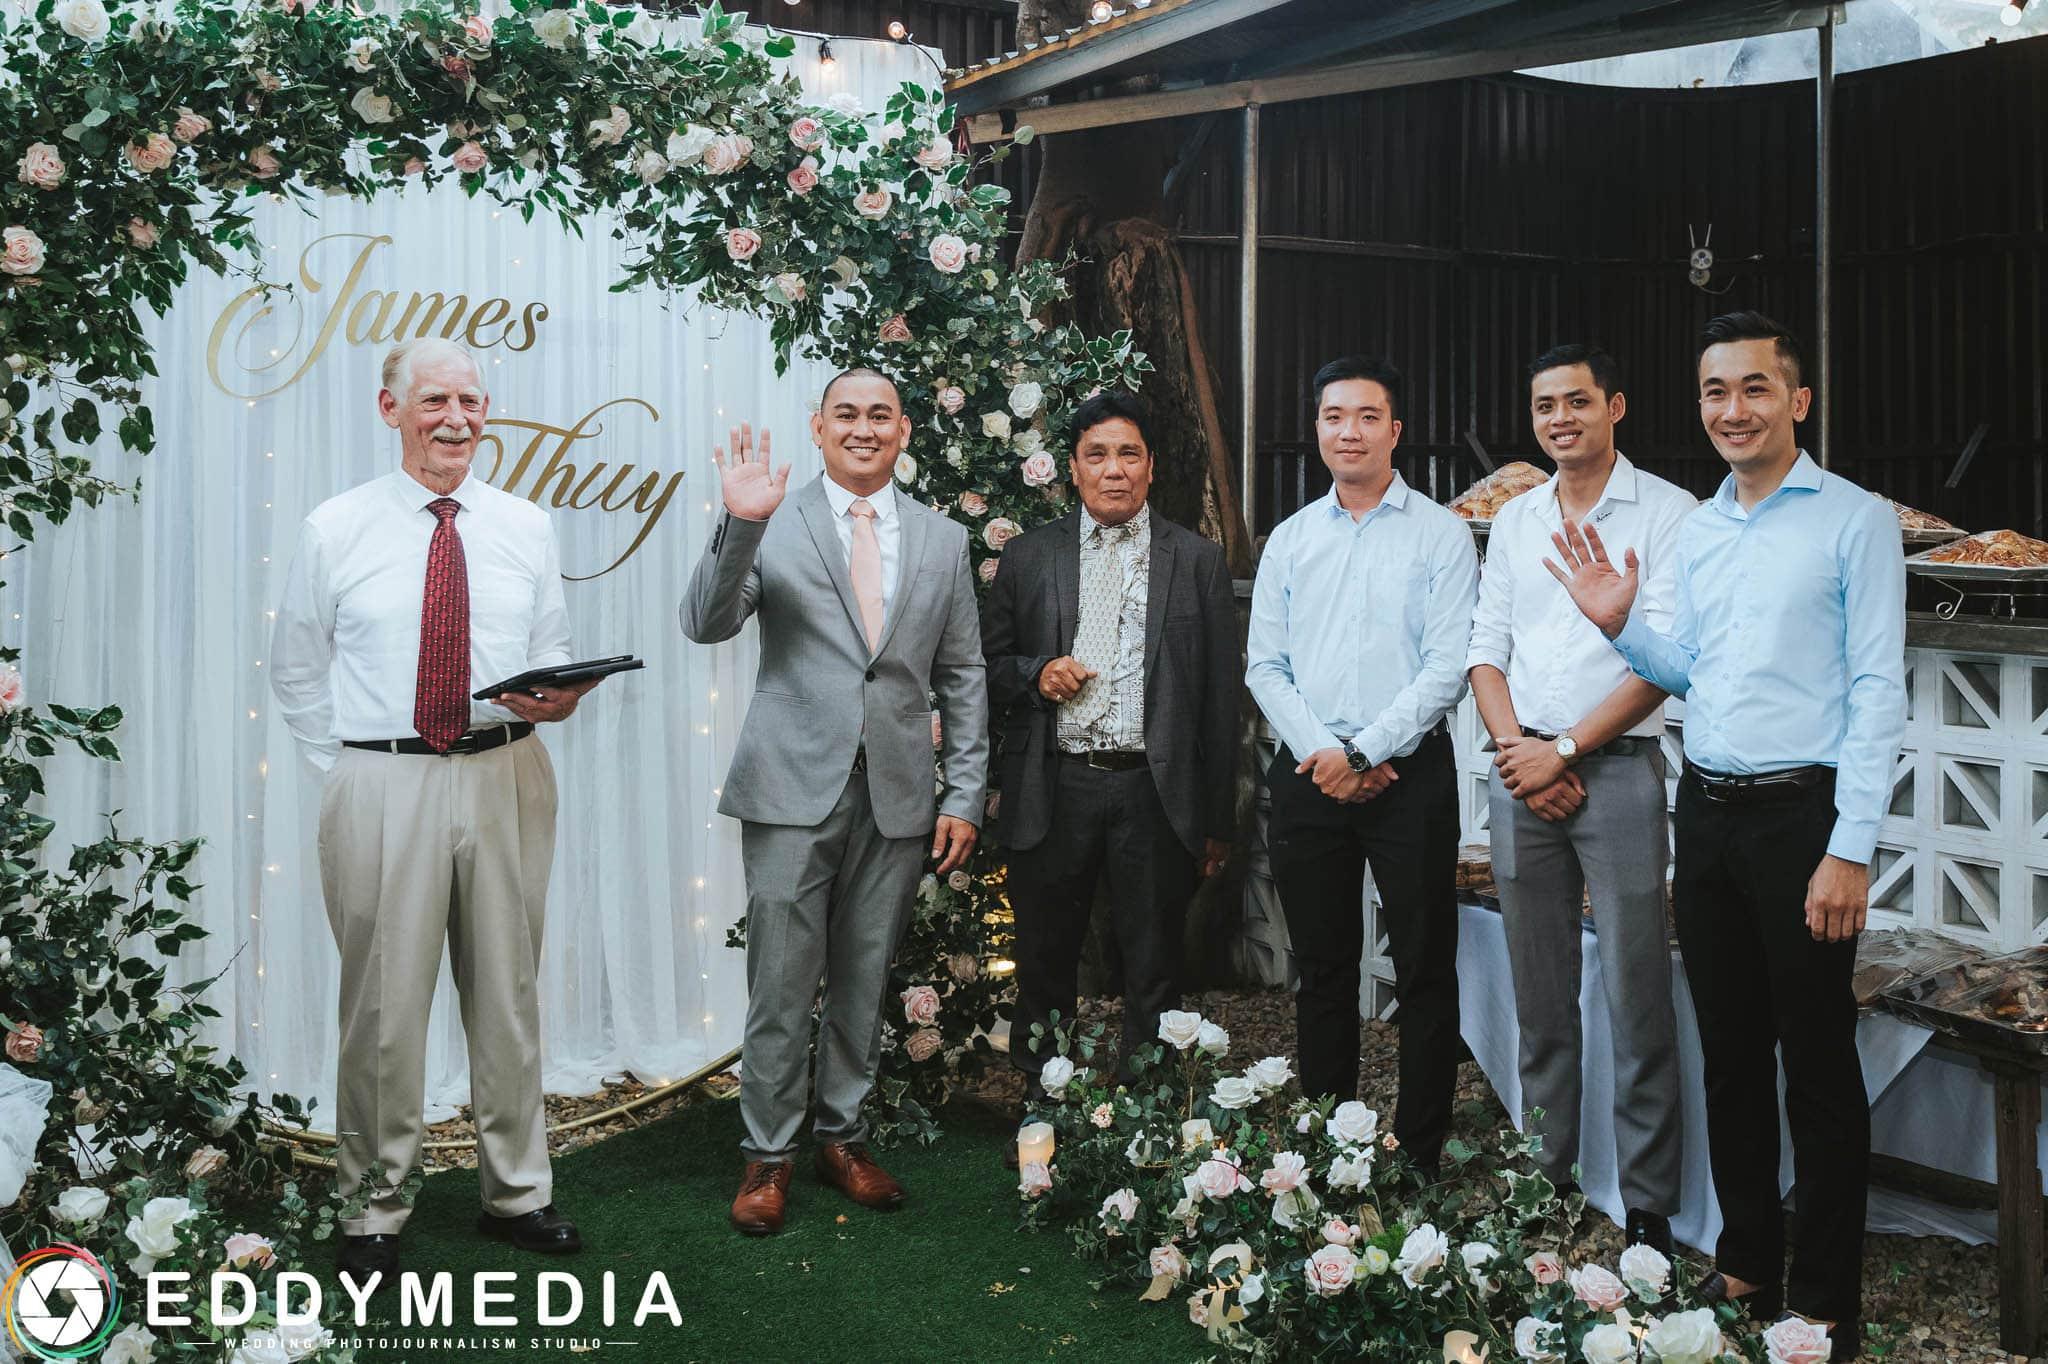 Phongsucuoi James KieuThuy EddyMedia 25 tiệc cưới ngoài trời